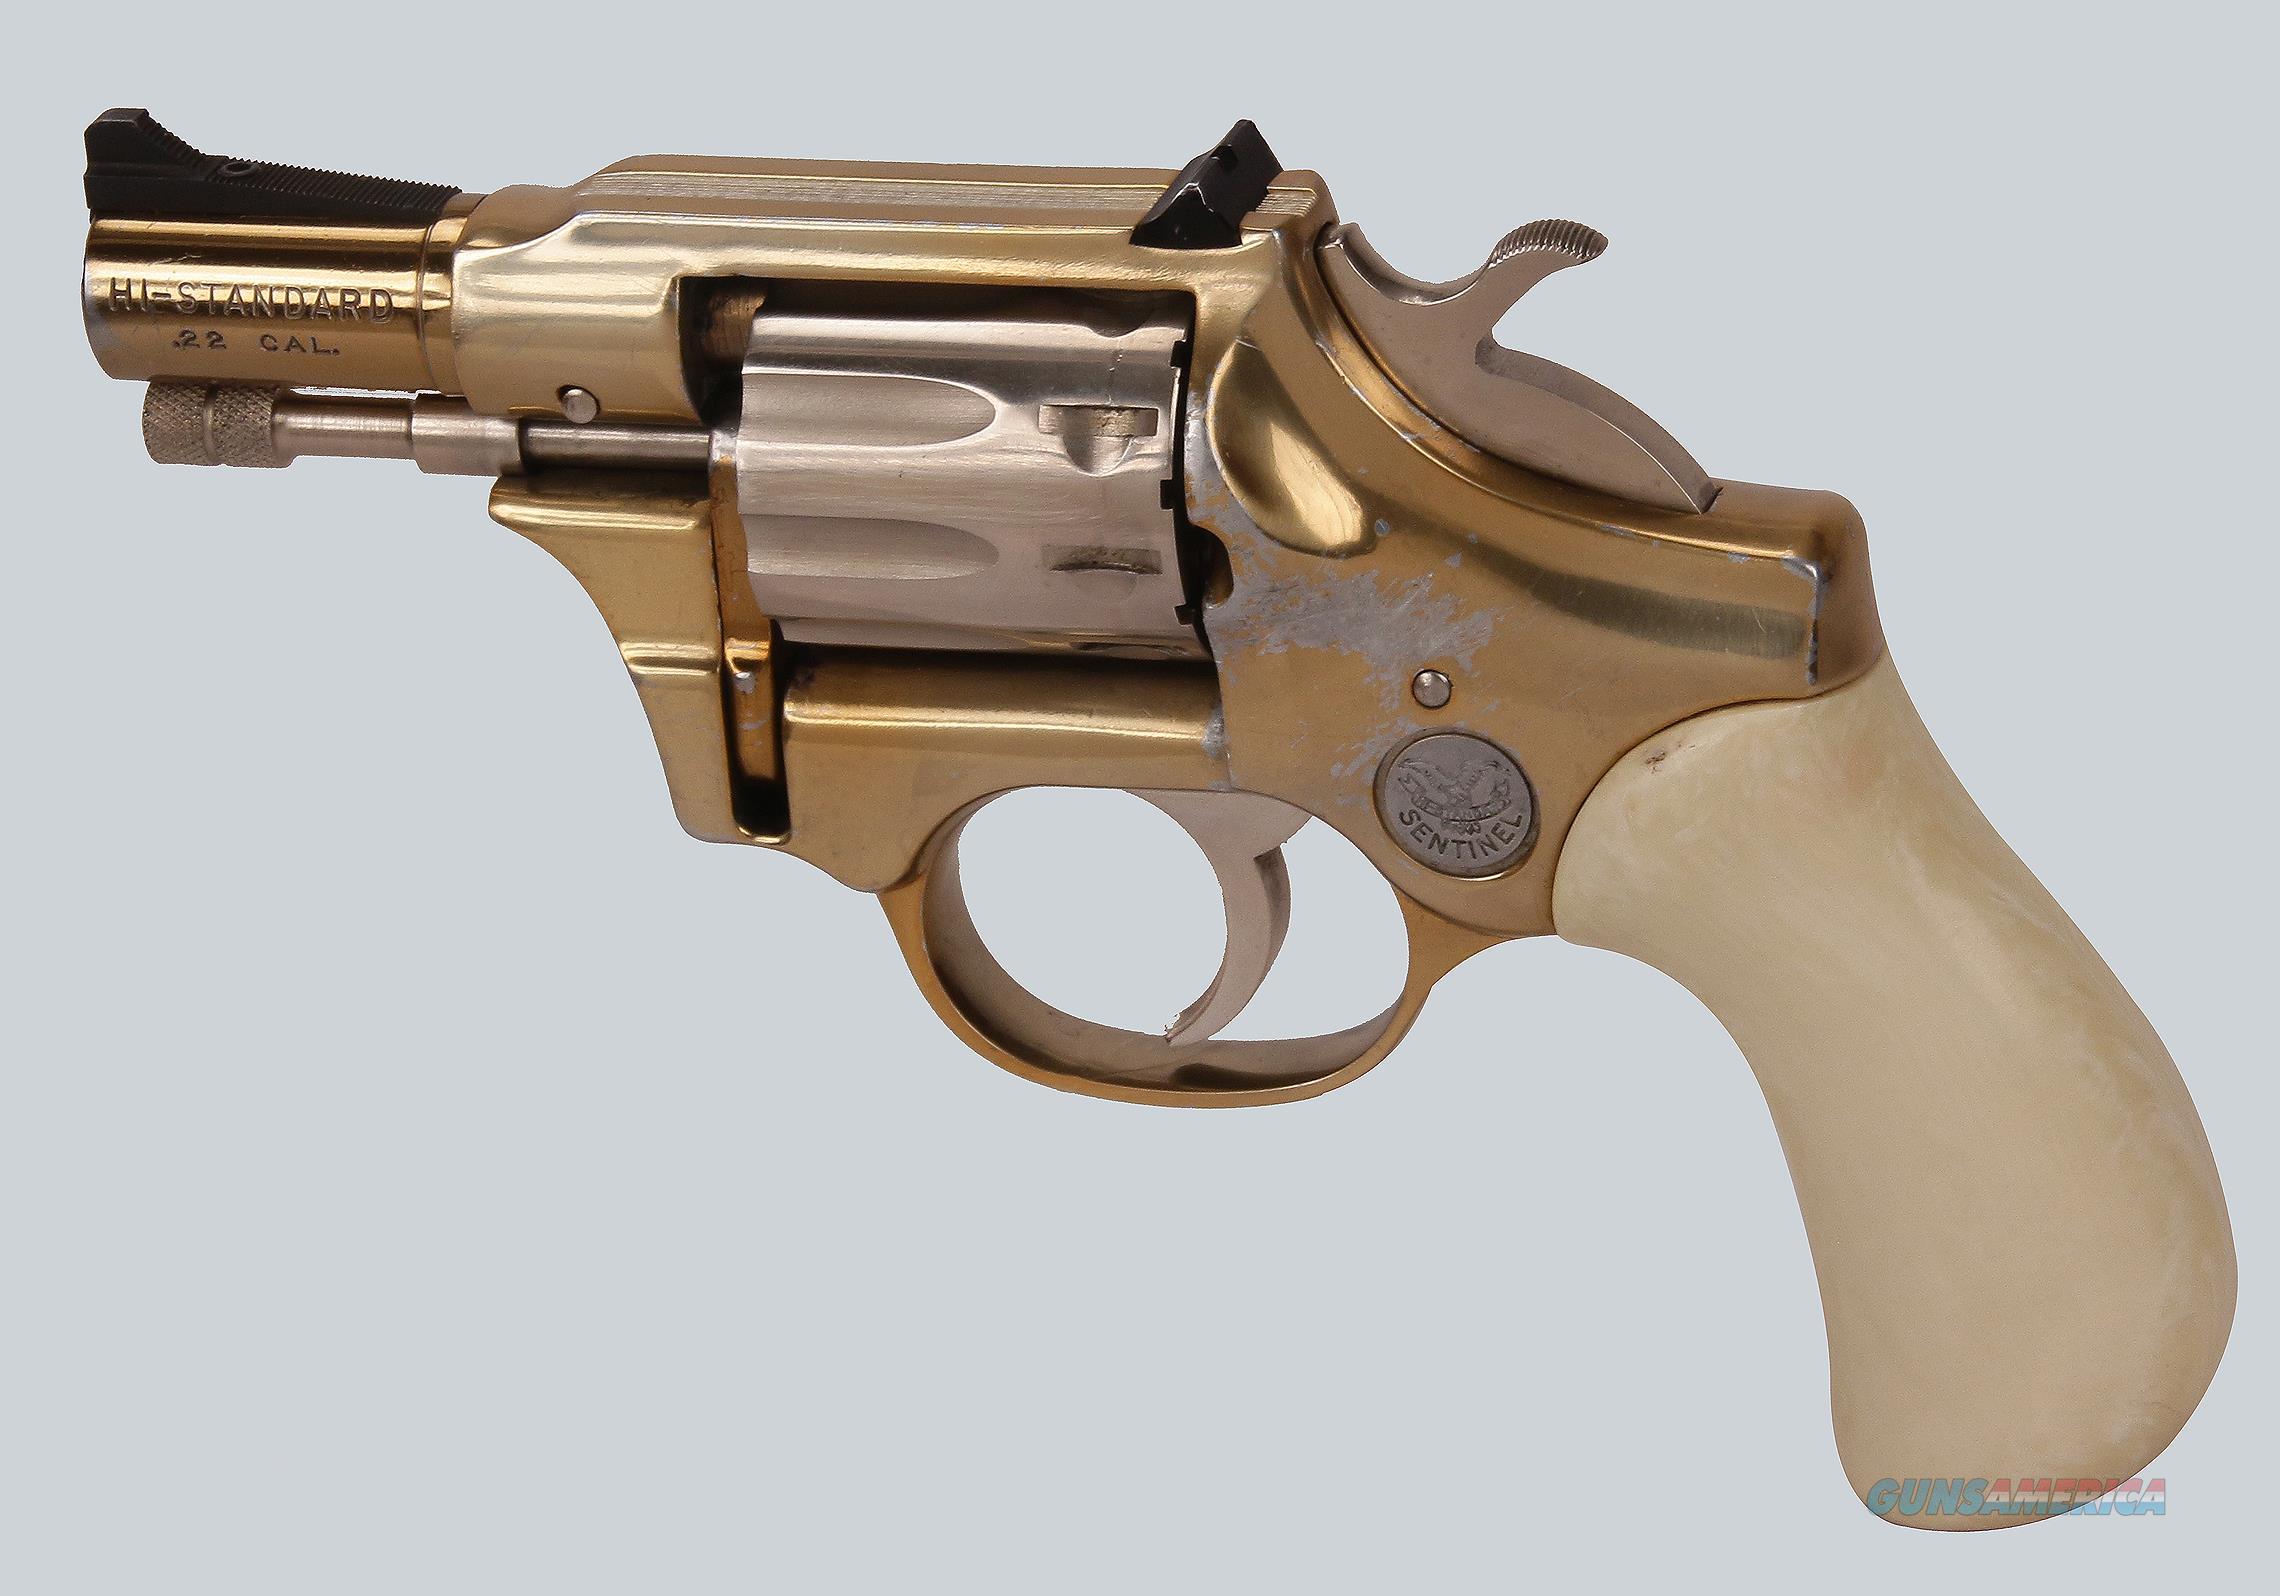 High Standard 22LR R-101 Sentinel Revolver  Guns > Pistols > High Standard Pistols